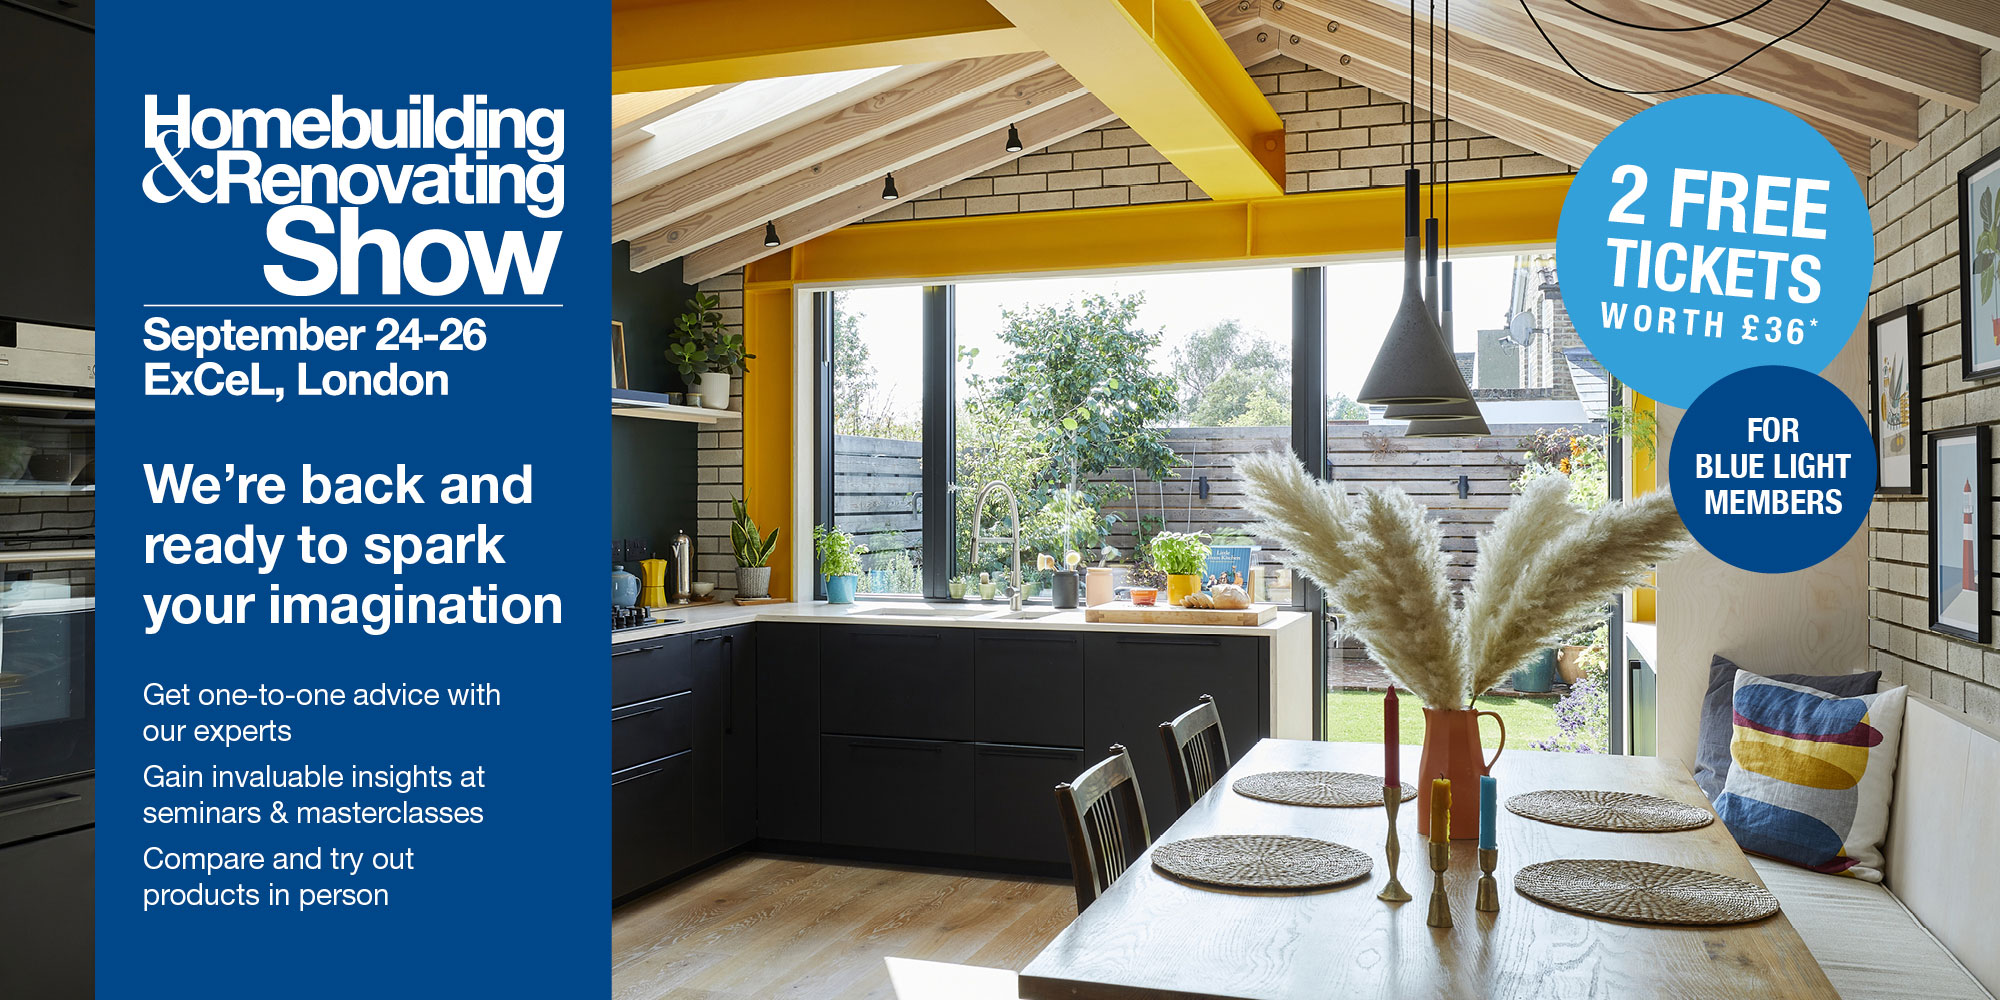 Homebuilding & Renovating Show - London